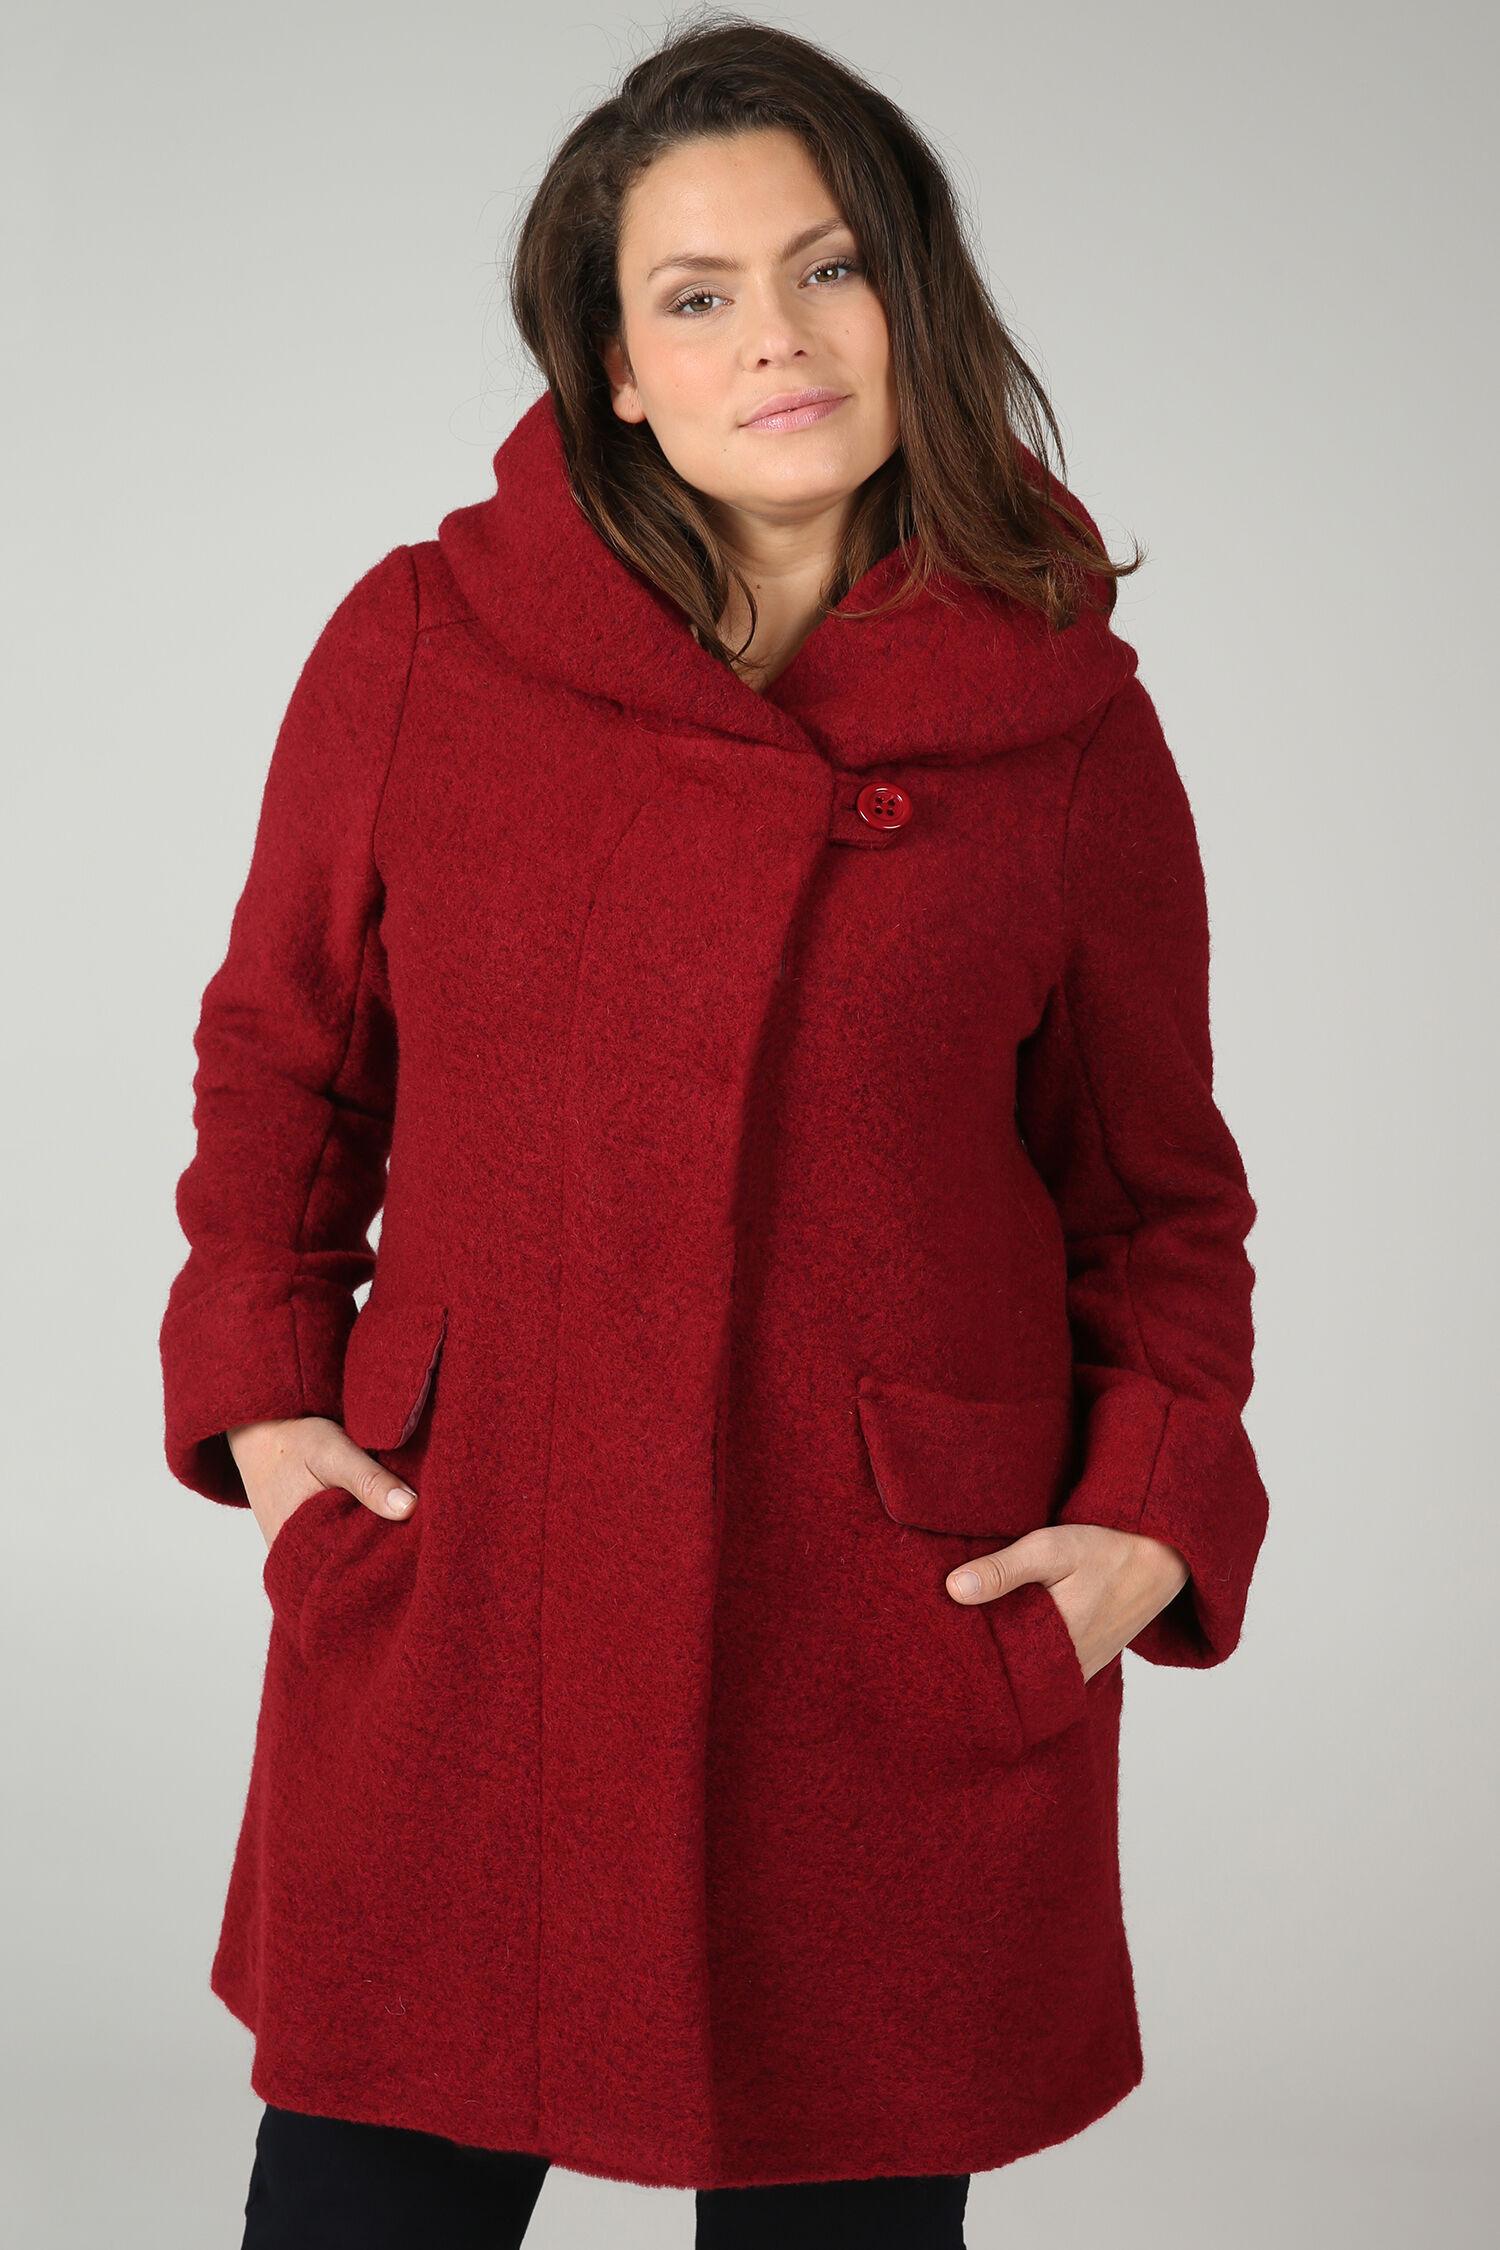 Manteau femme grande taille original noir